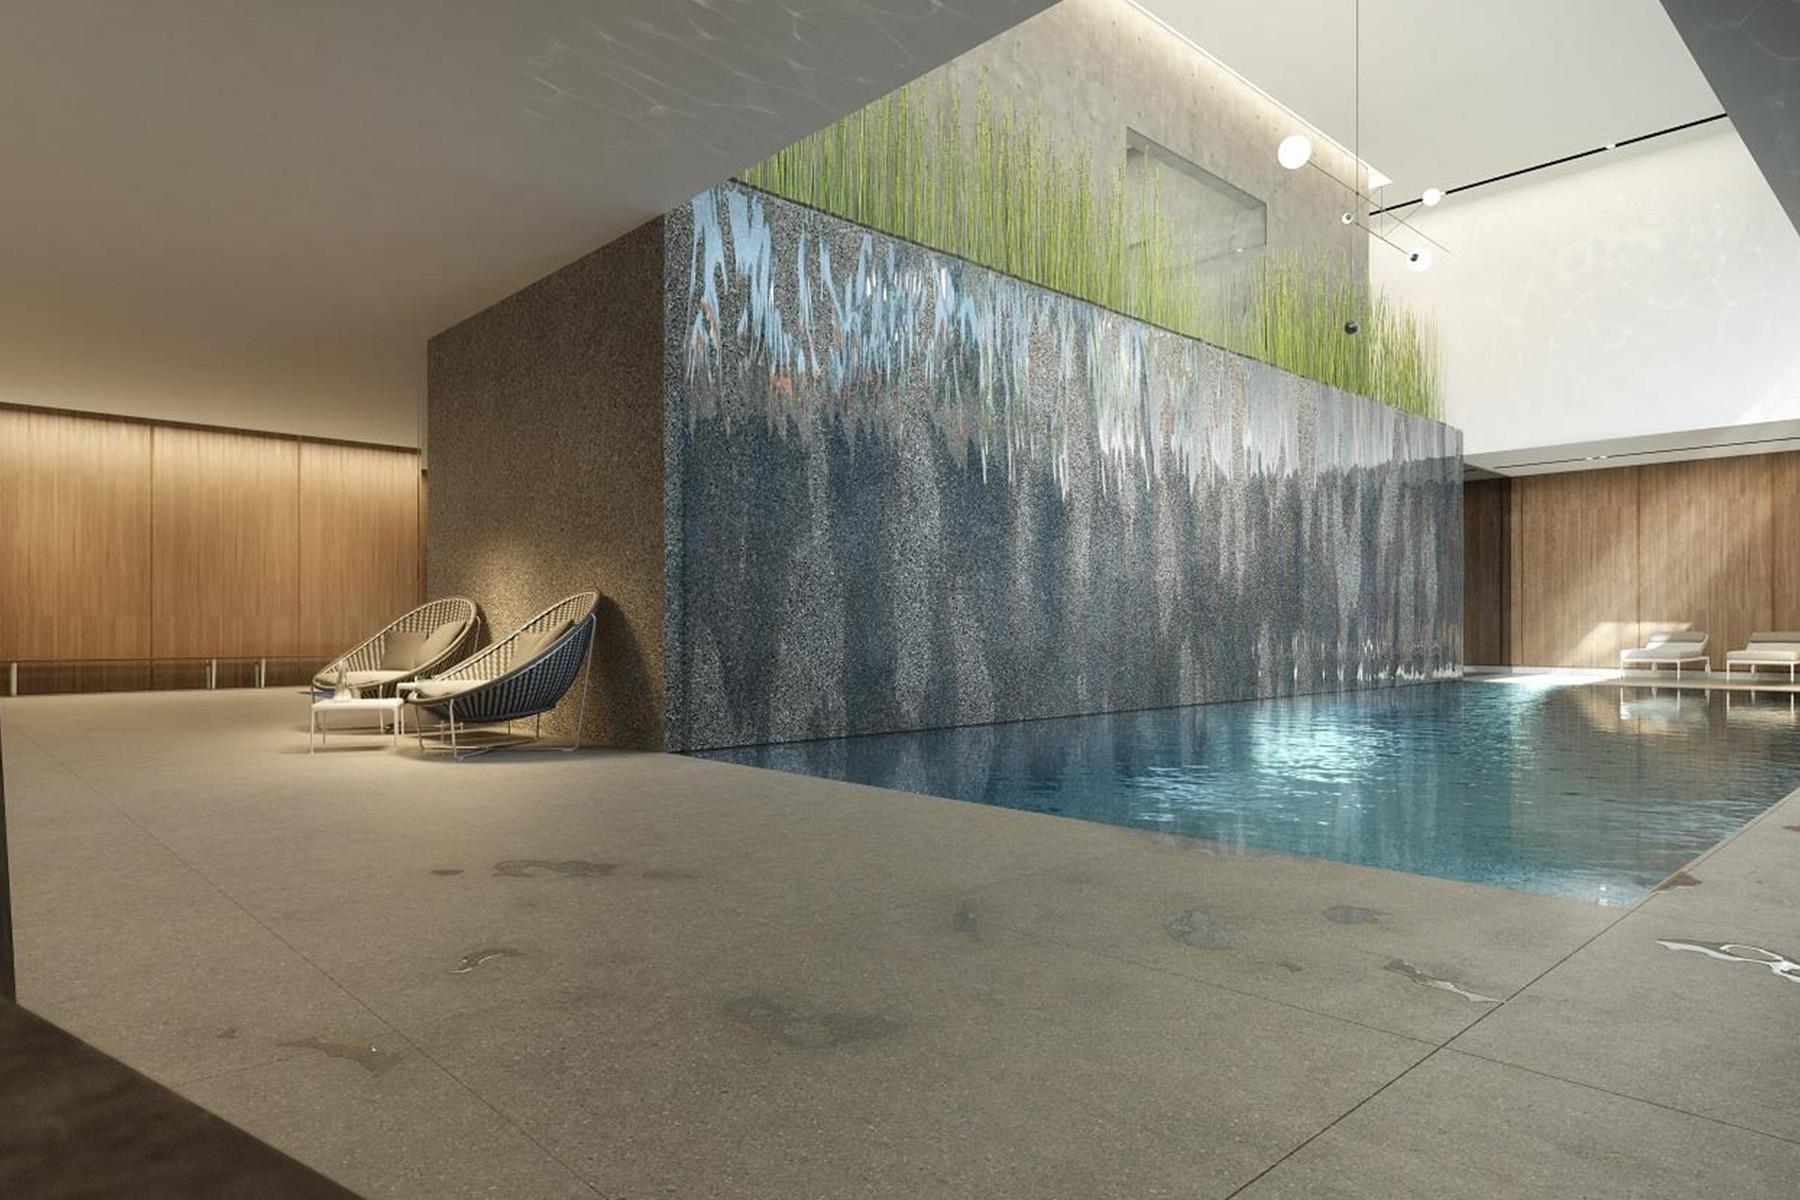 David iltis architecte mulhouse 3d spa design david for Architecte d interieur mulhouse